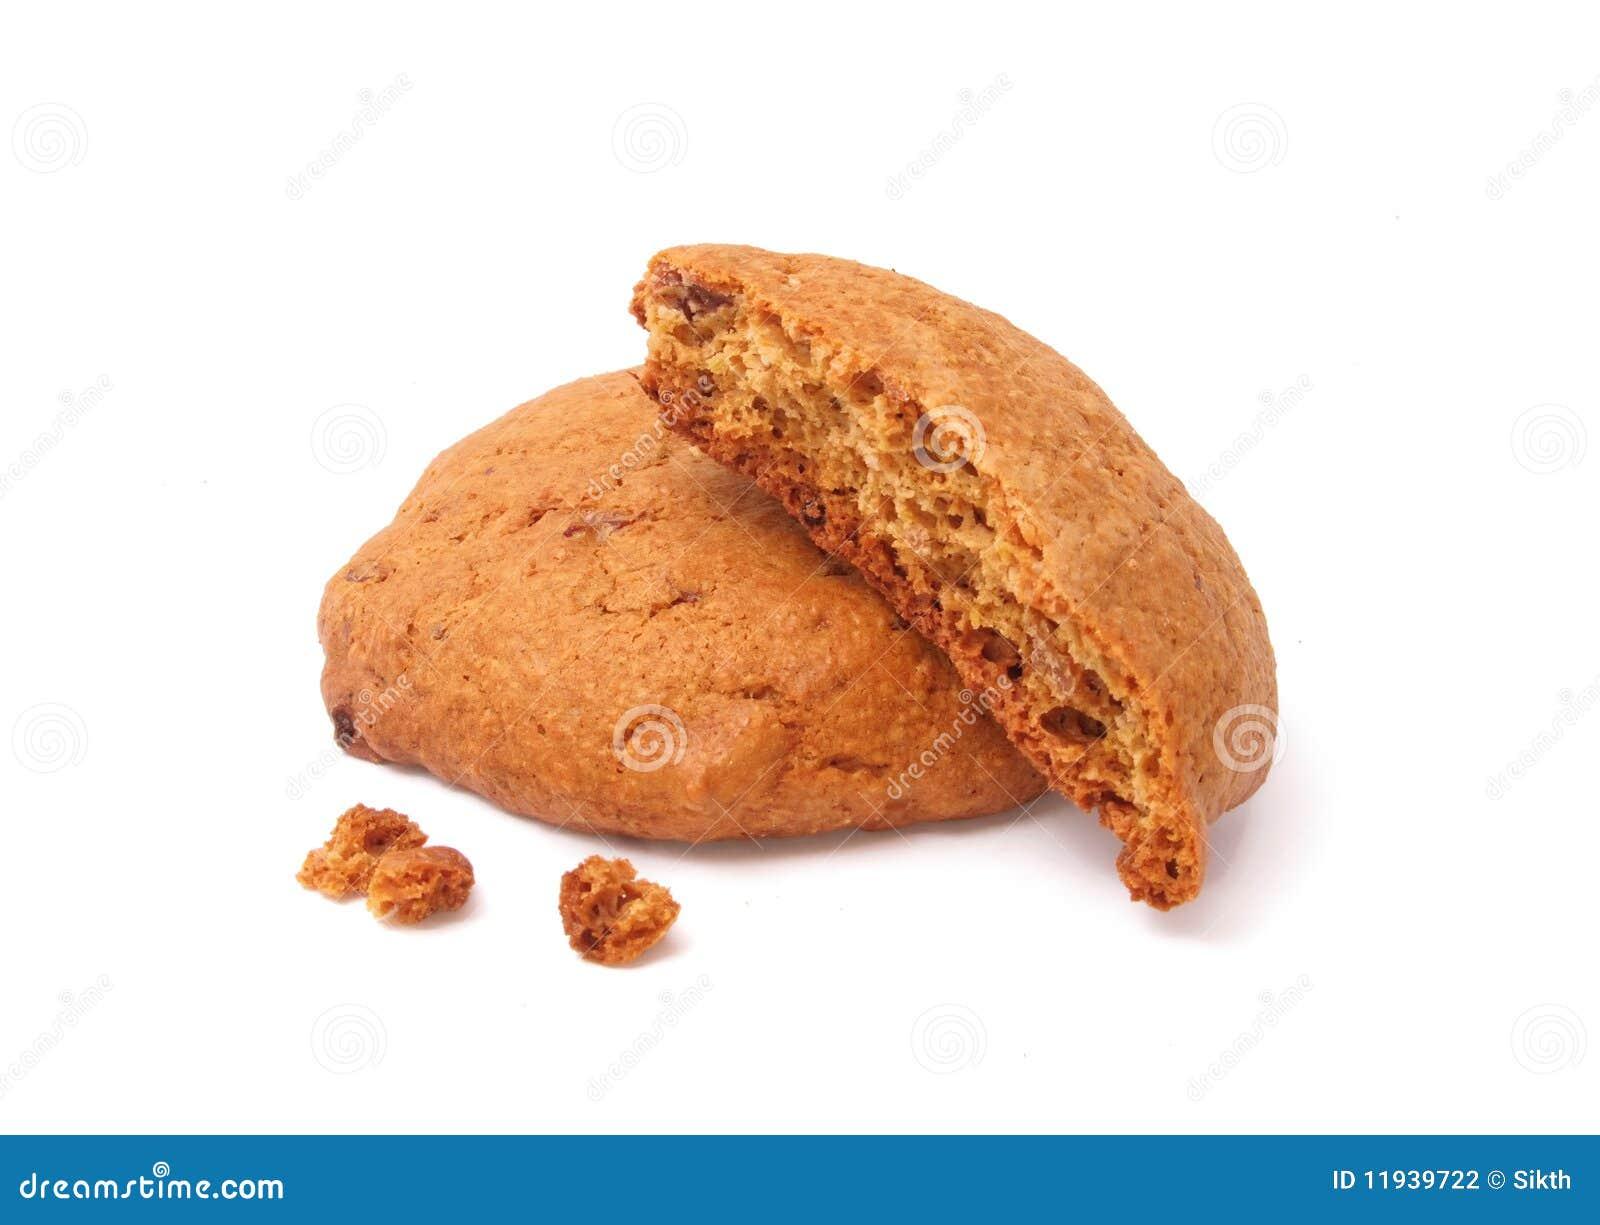 how to keep cookies crispy